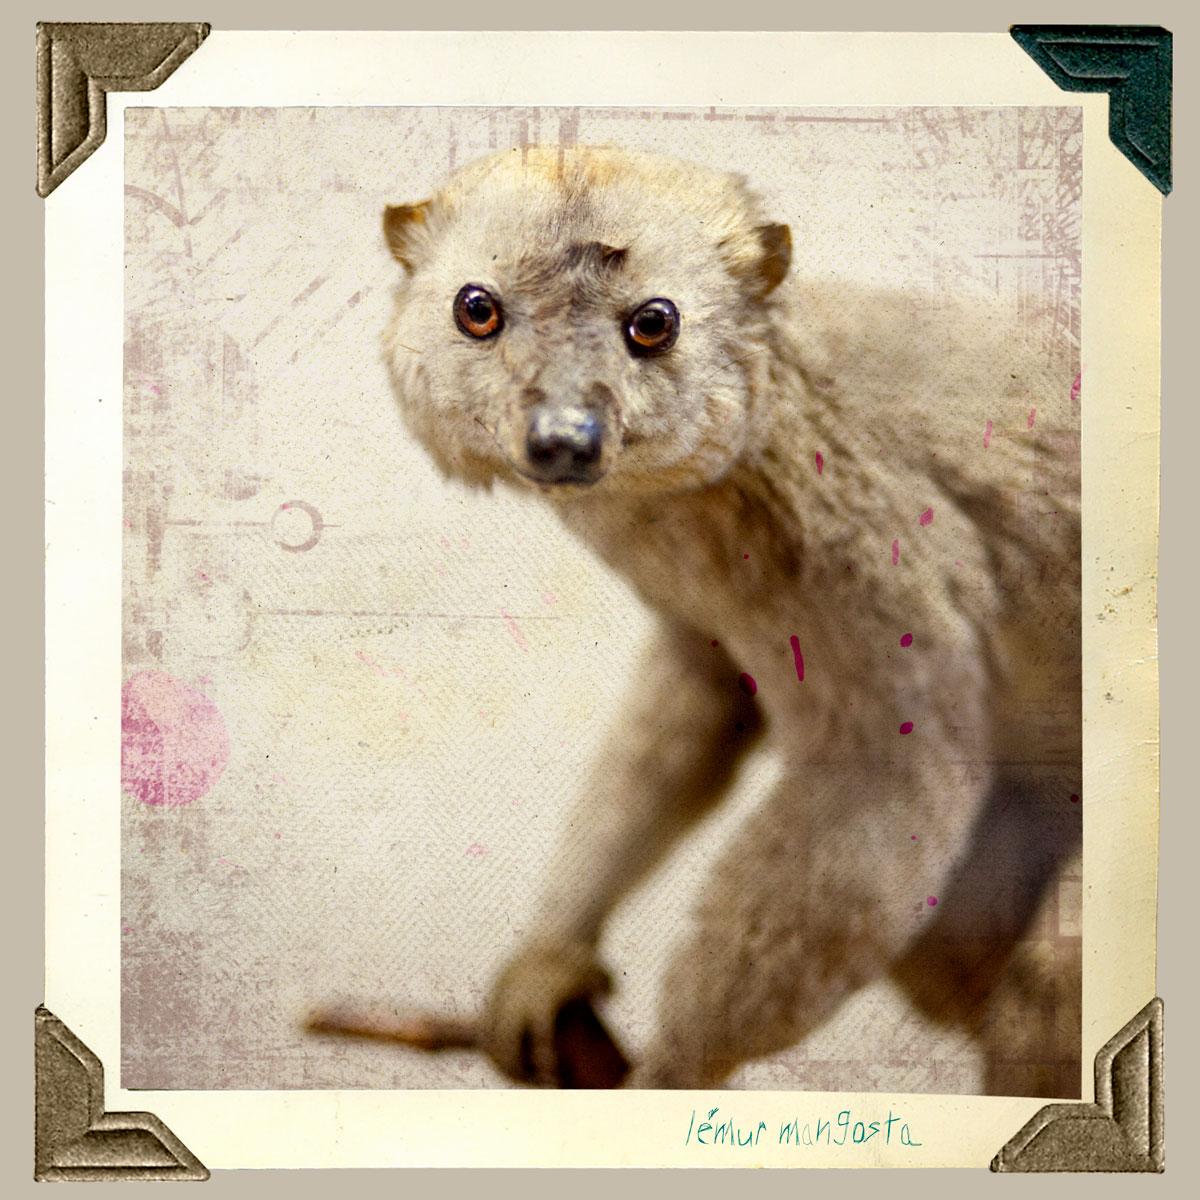 lemur mangosta animal disecado anaima